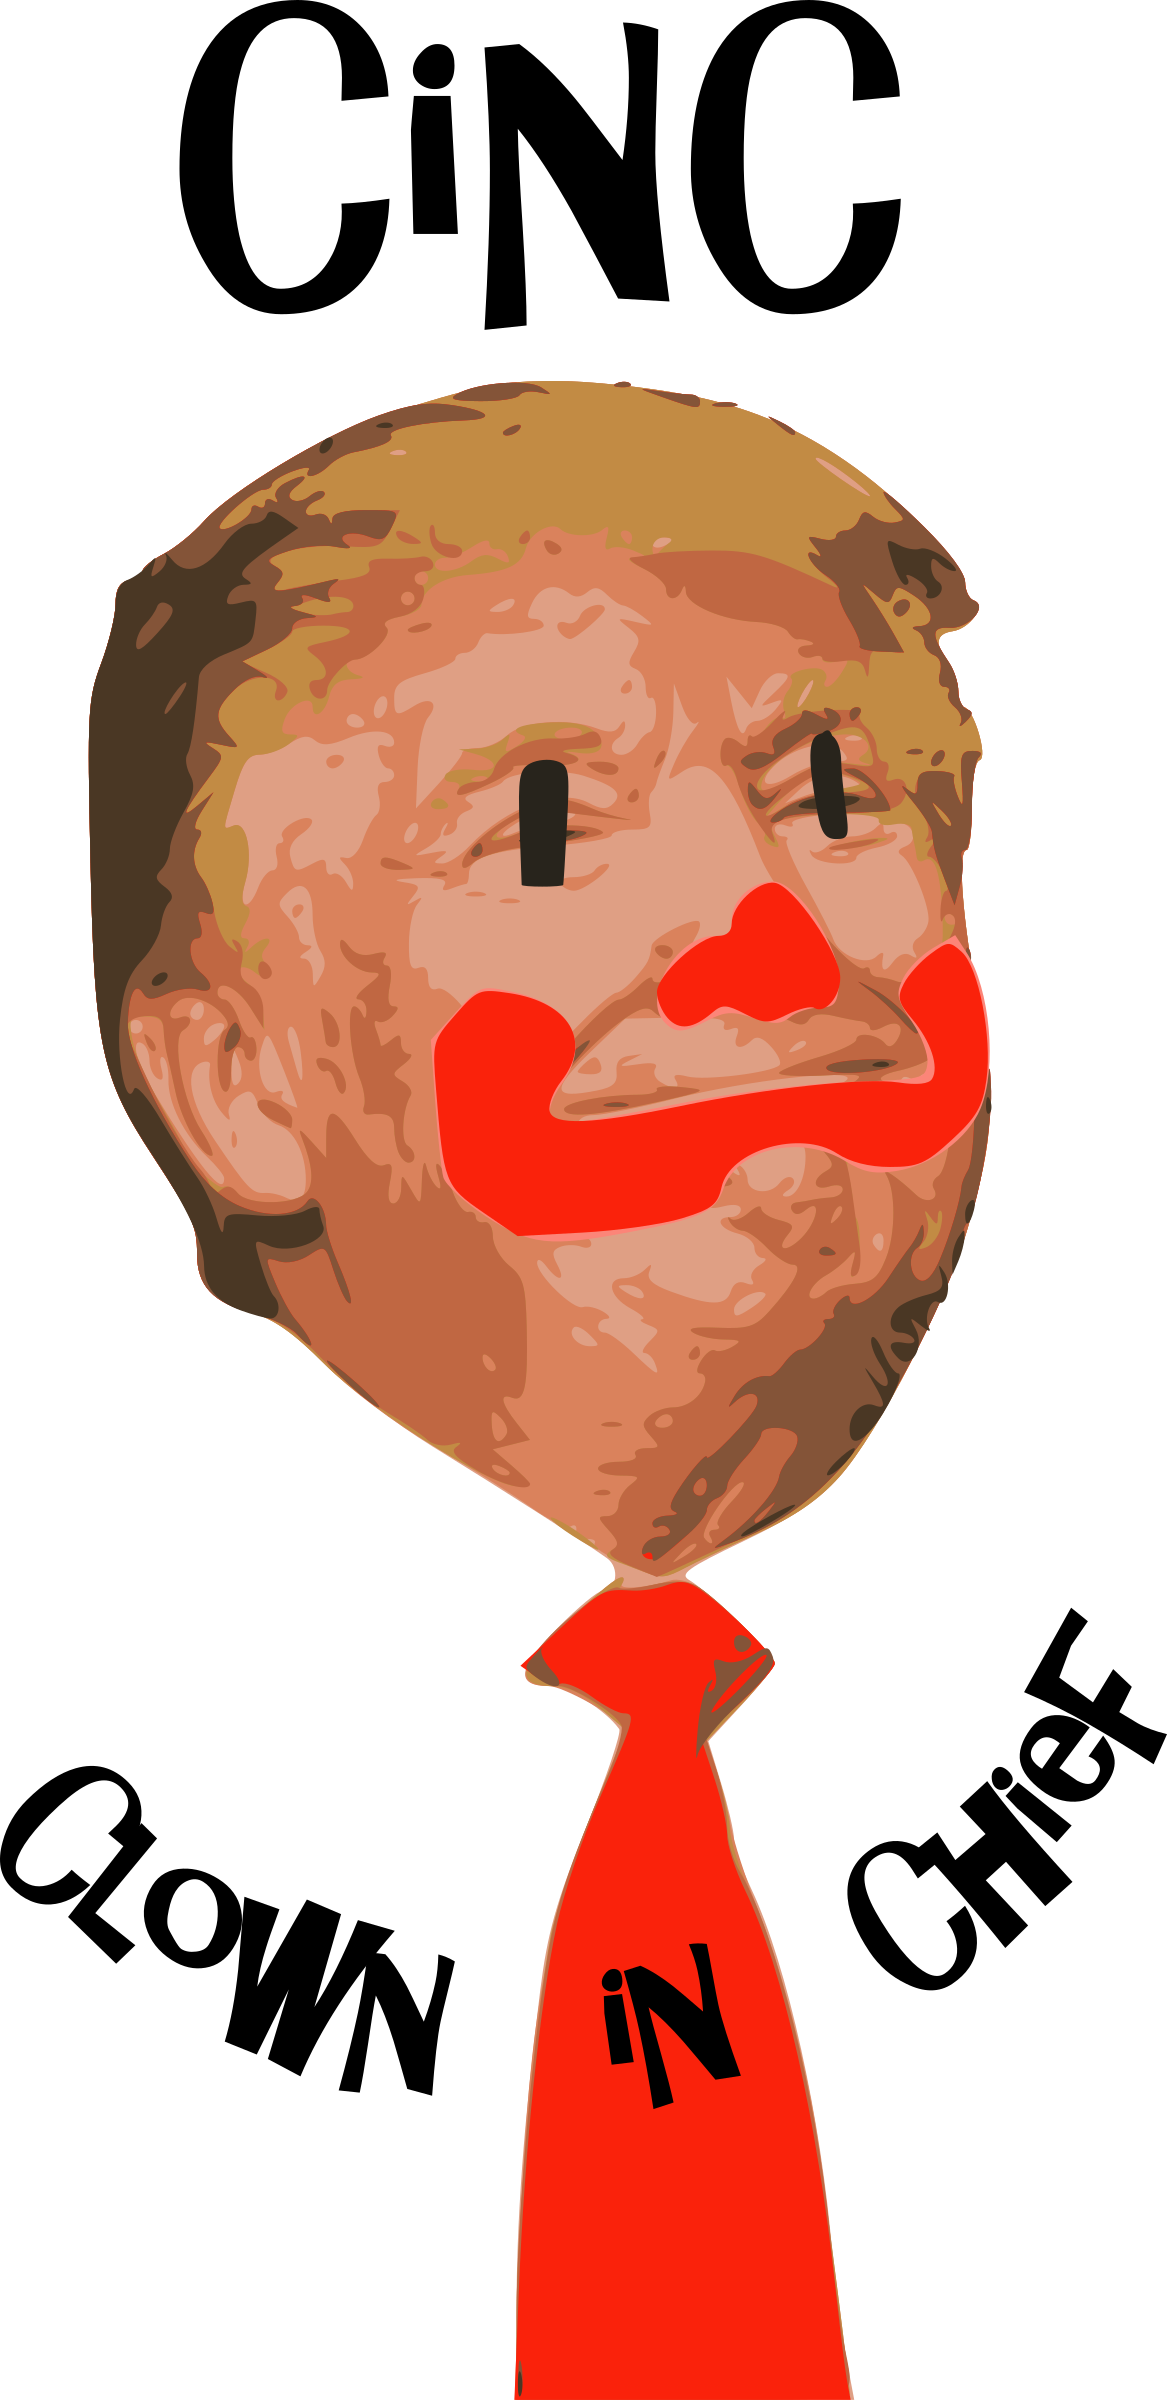 1167x2400 Clown In Chief, Donald Trump Face Vector Clipart Clown In Chief